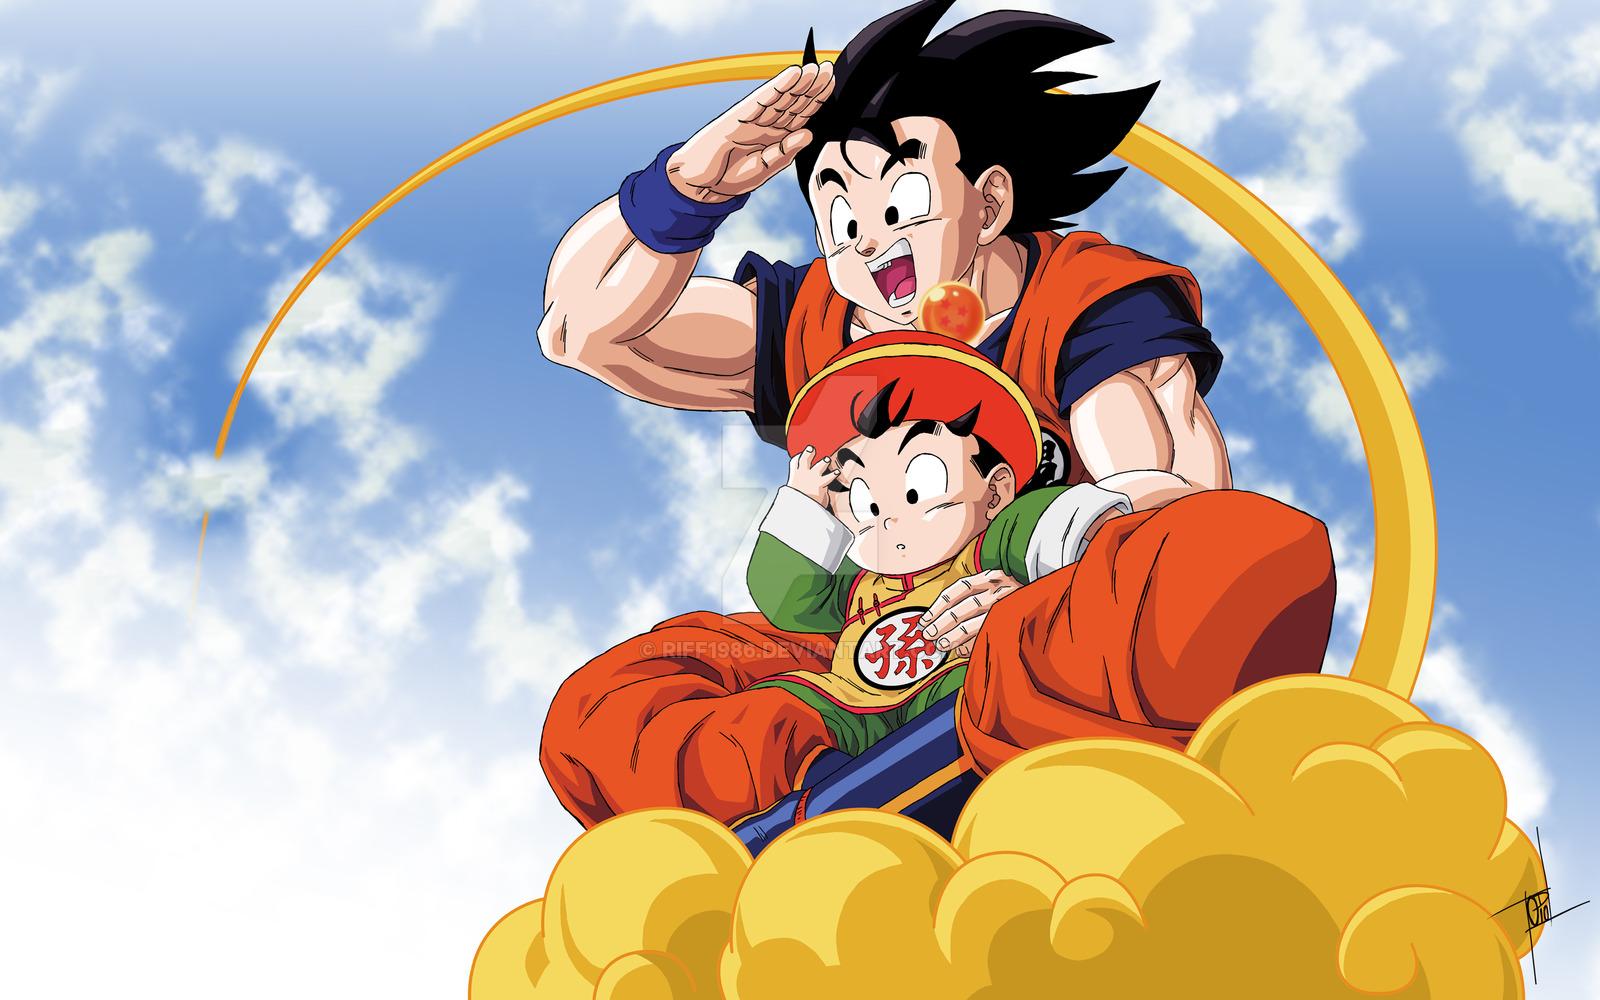 Goku & gohan wallpaper hd